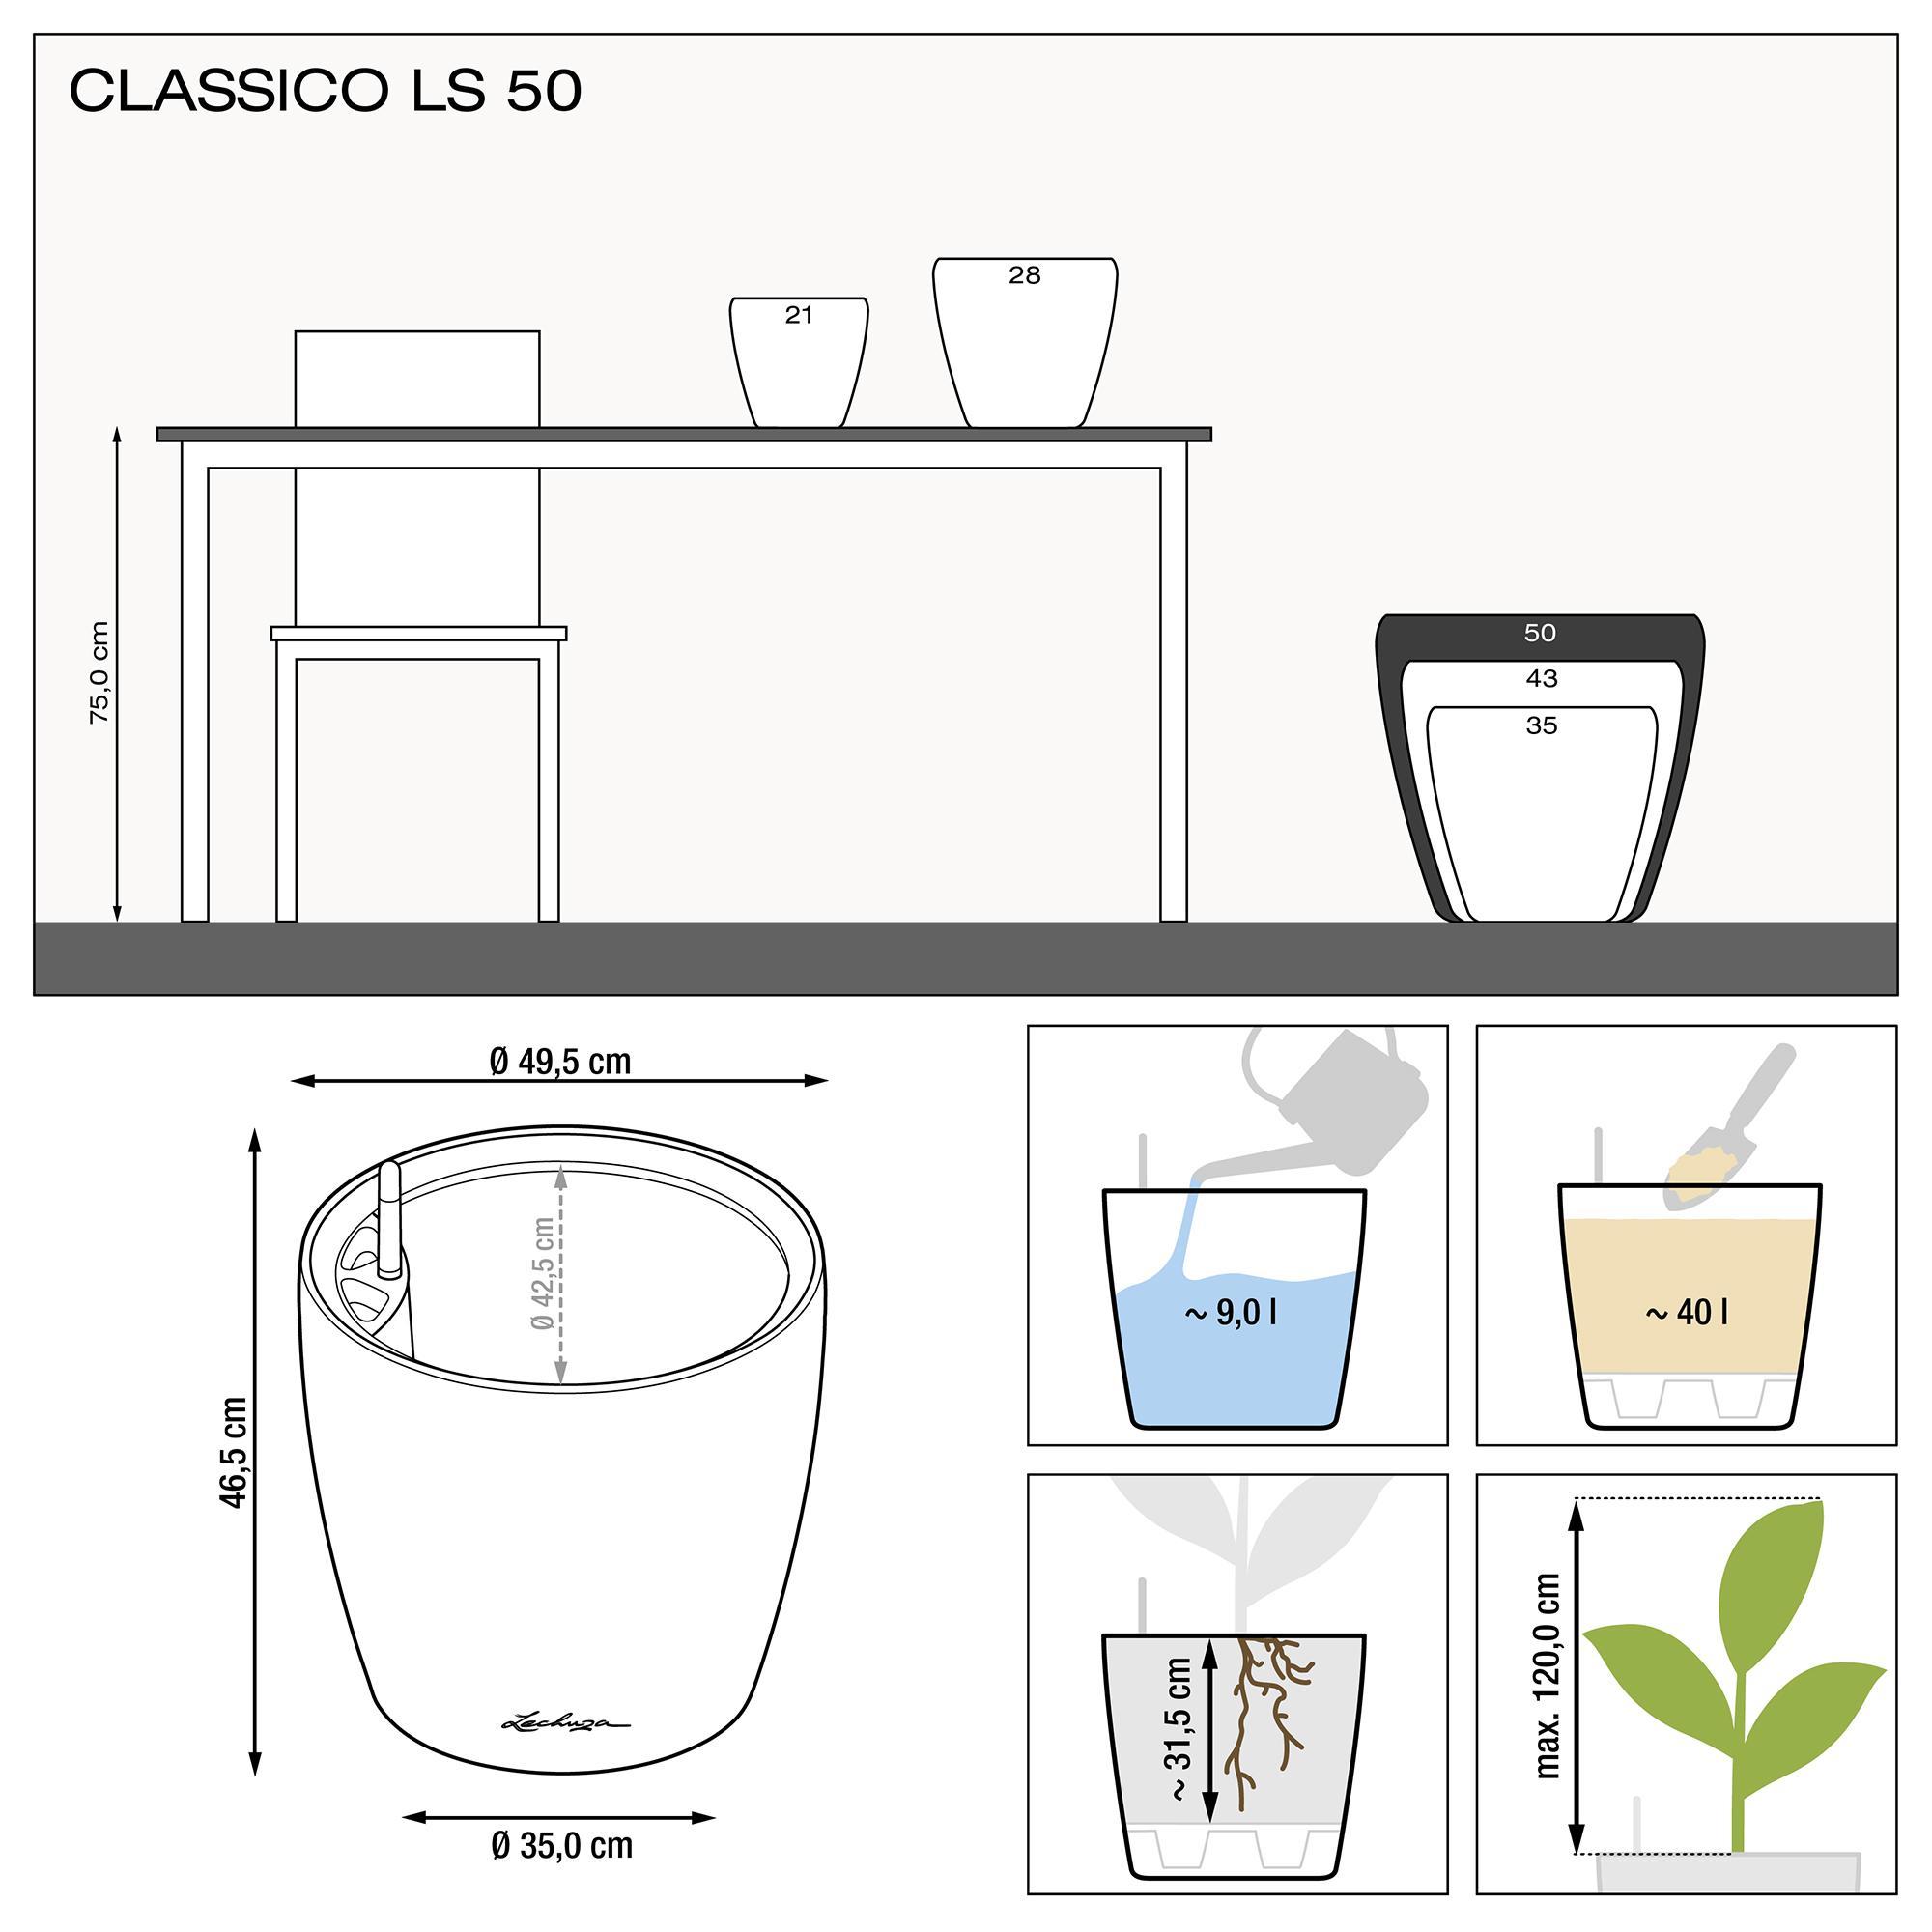 CLASSICO LS 50 white high-gloss - Image 3